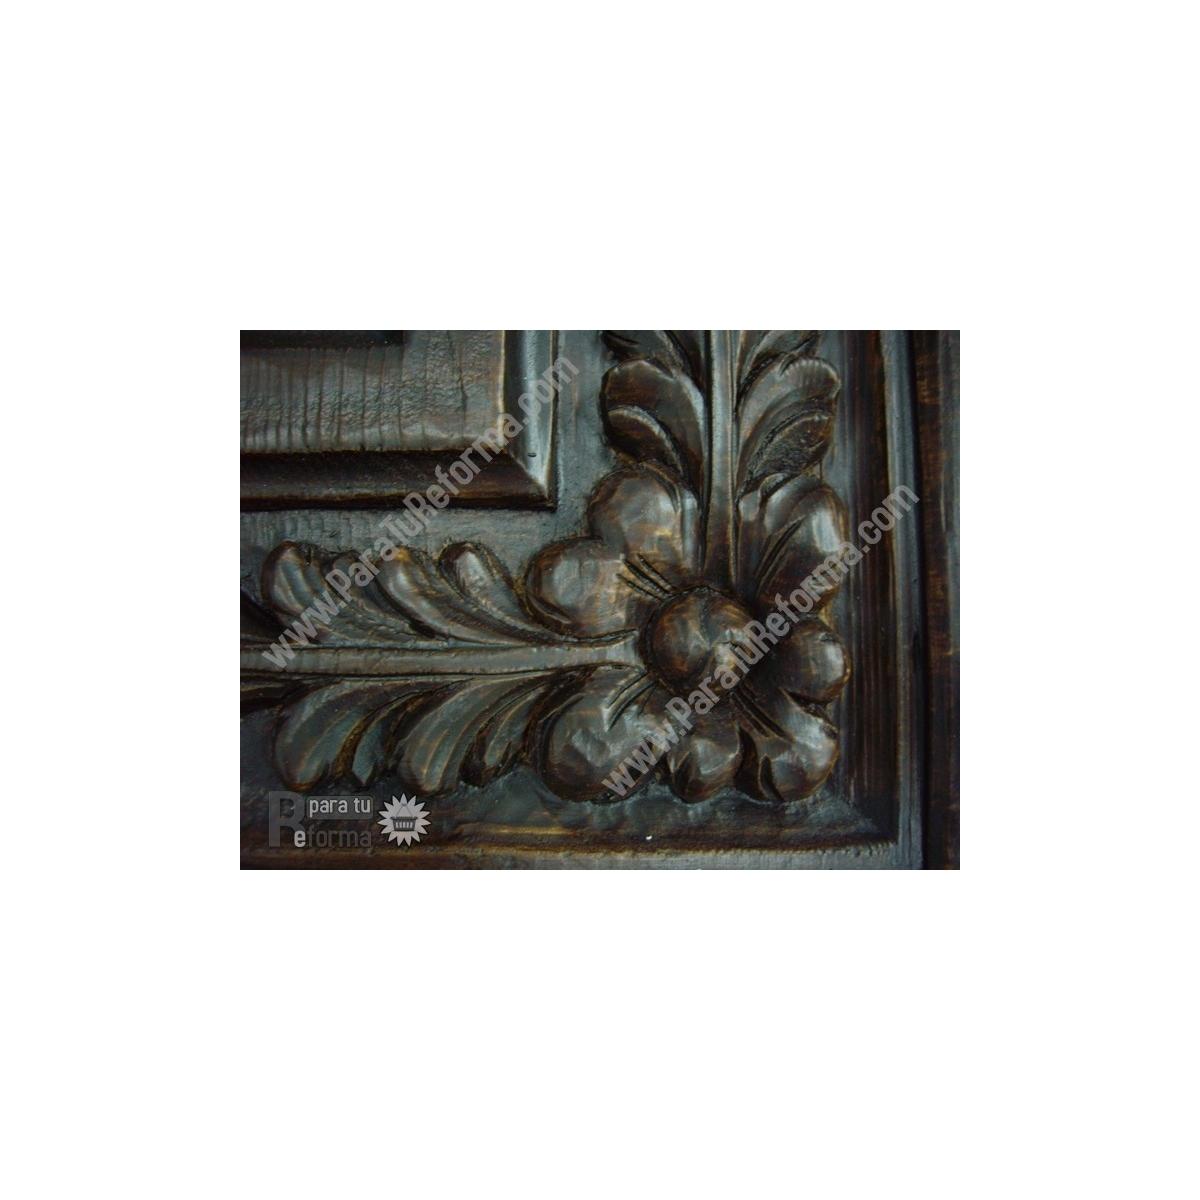 Plafón rústico imitación a madera 50x50 cm Plafones imitación madera de poliuretano